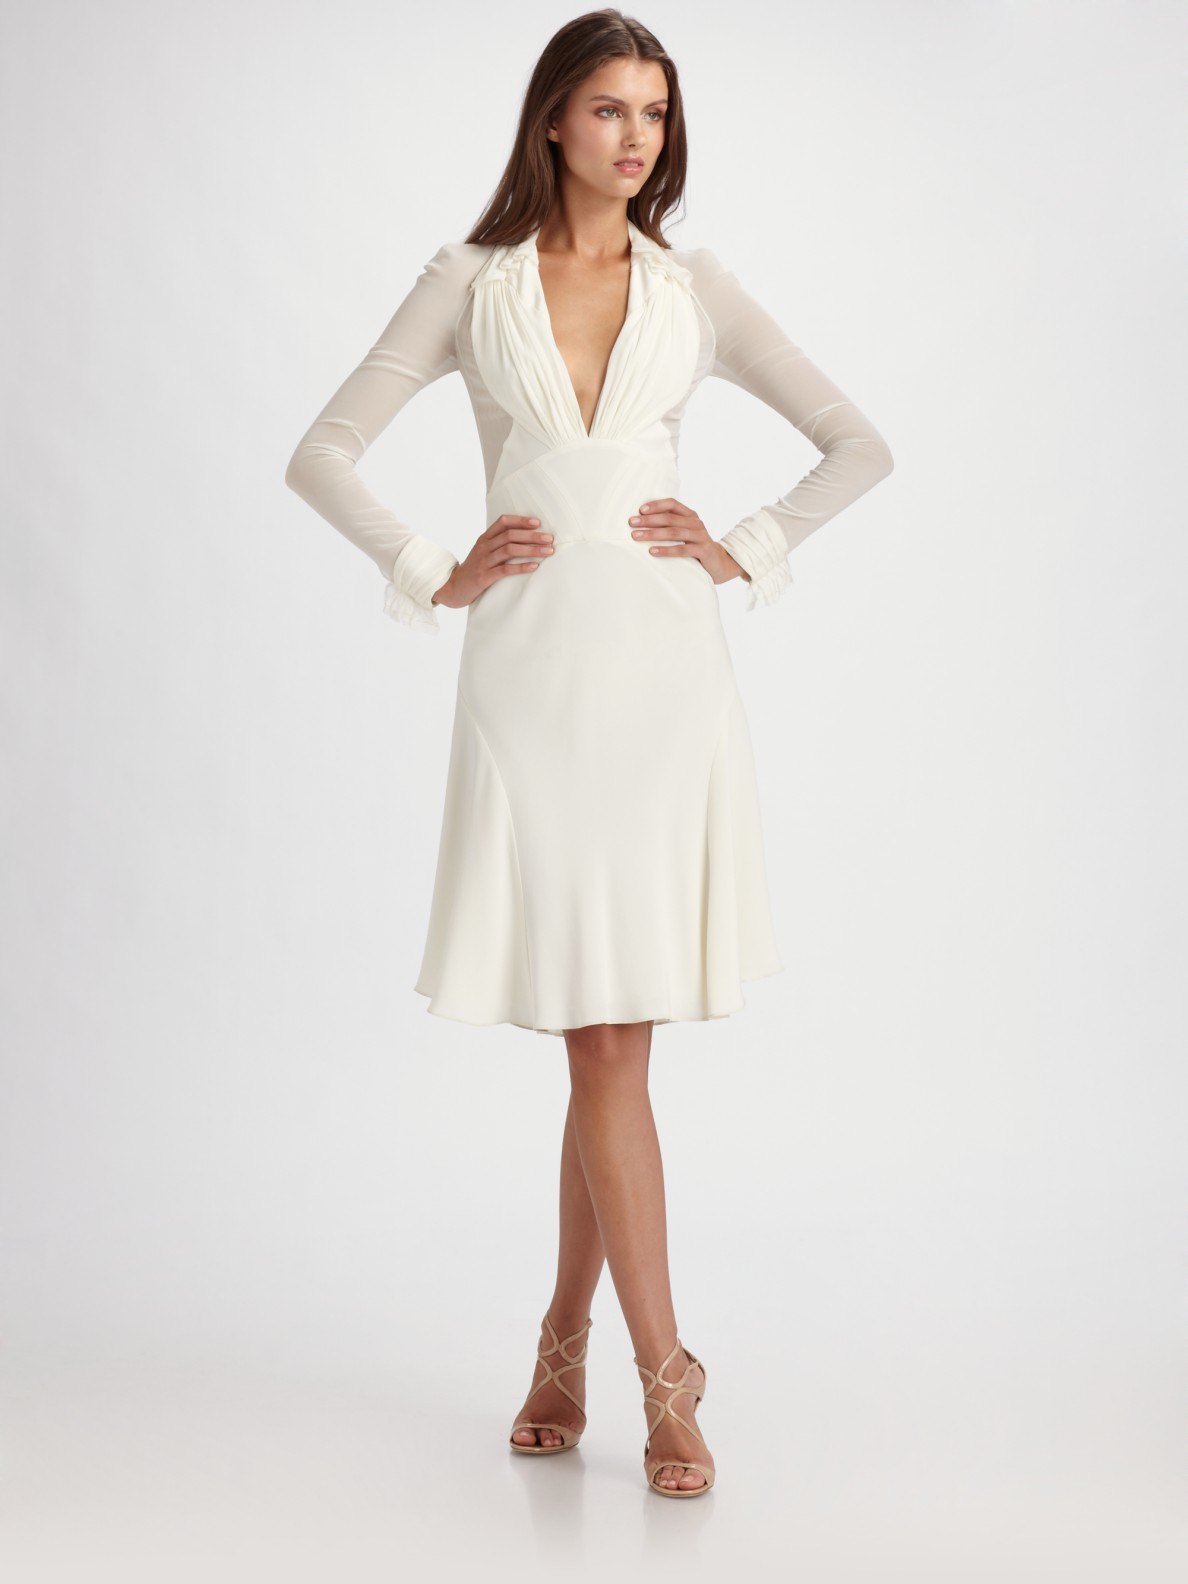 Zac Posen Crepe Amp Chiffon Long Sleeve Dress In Ivory